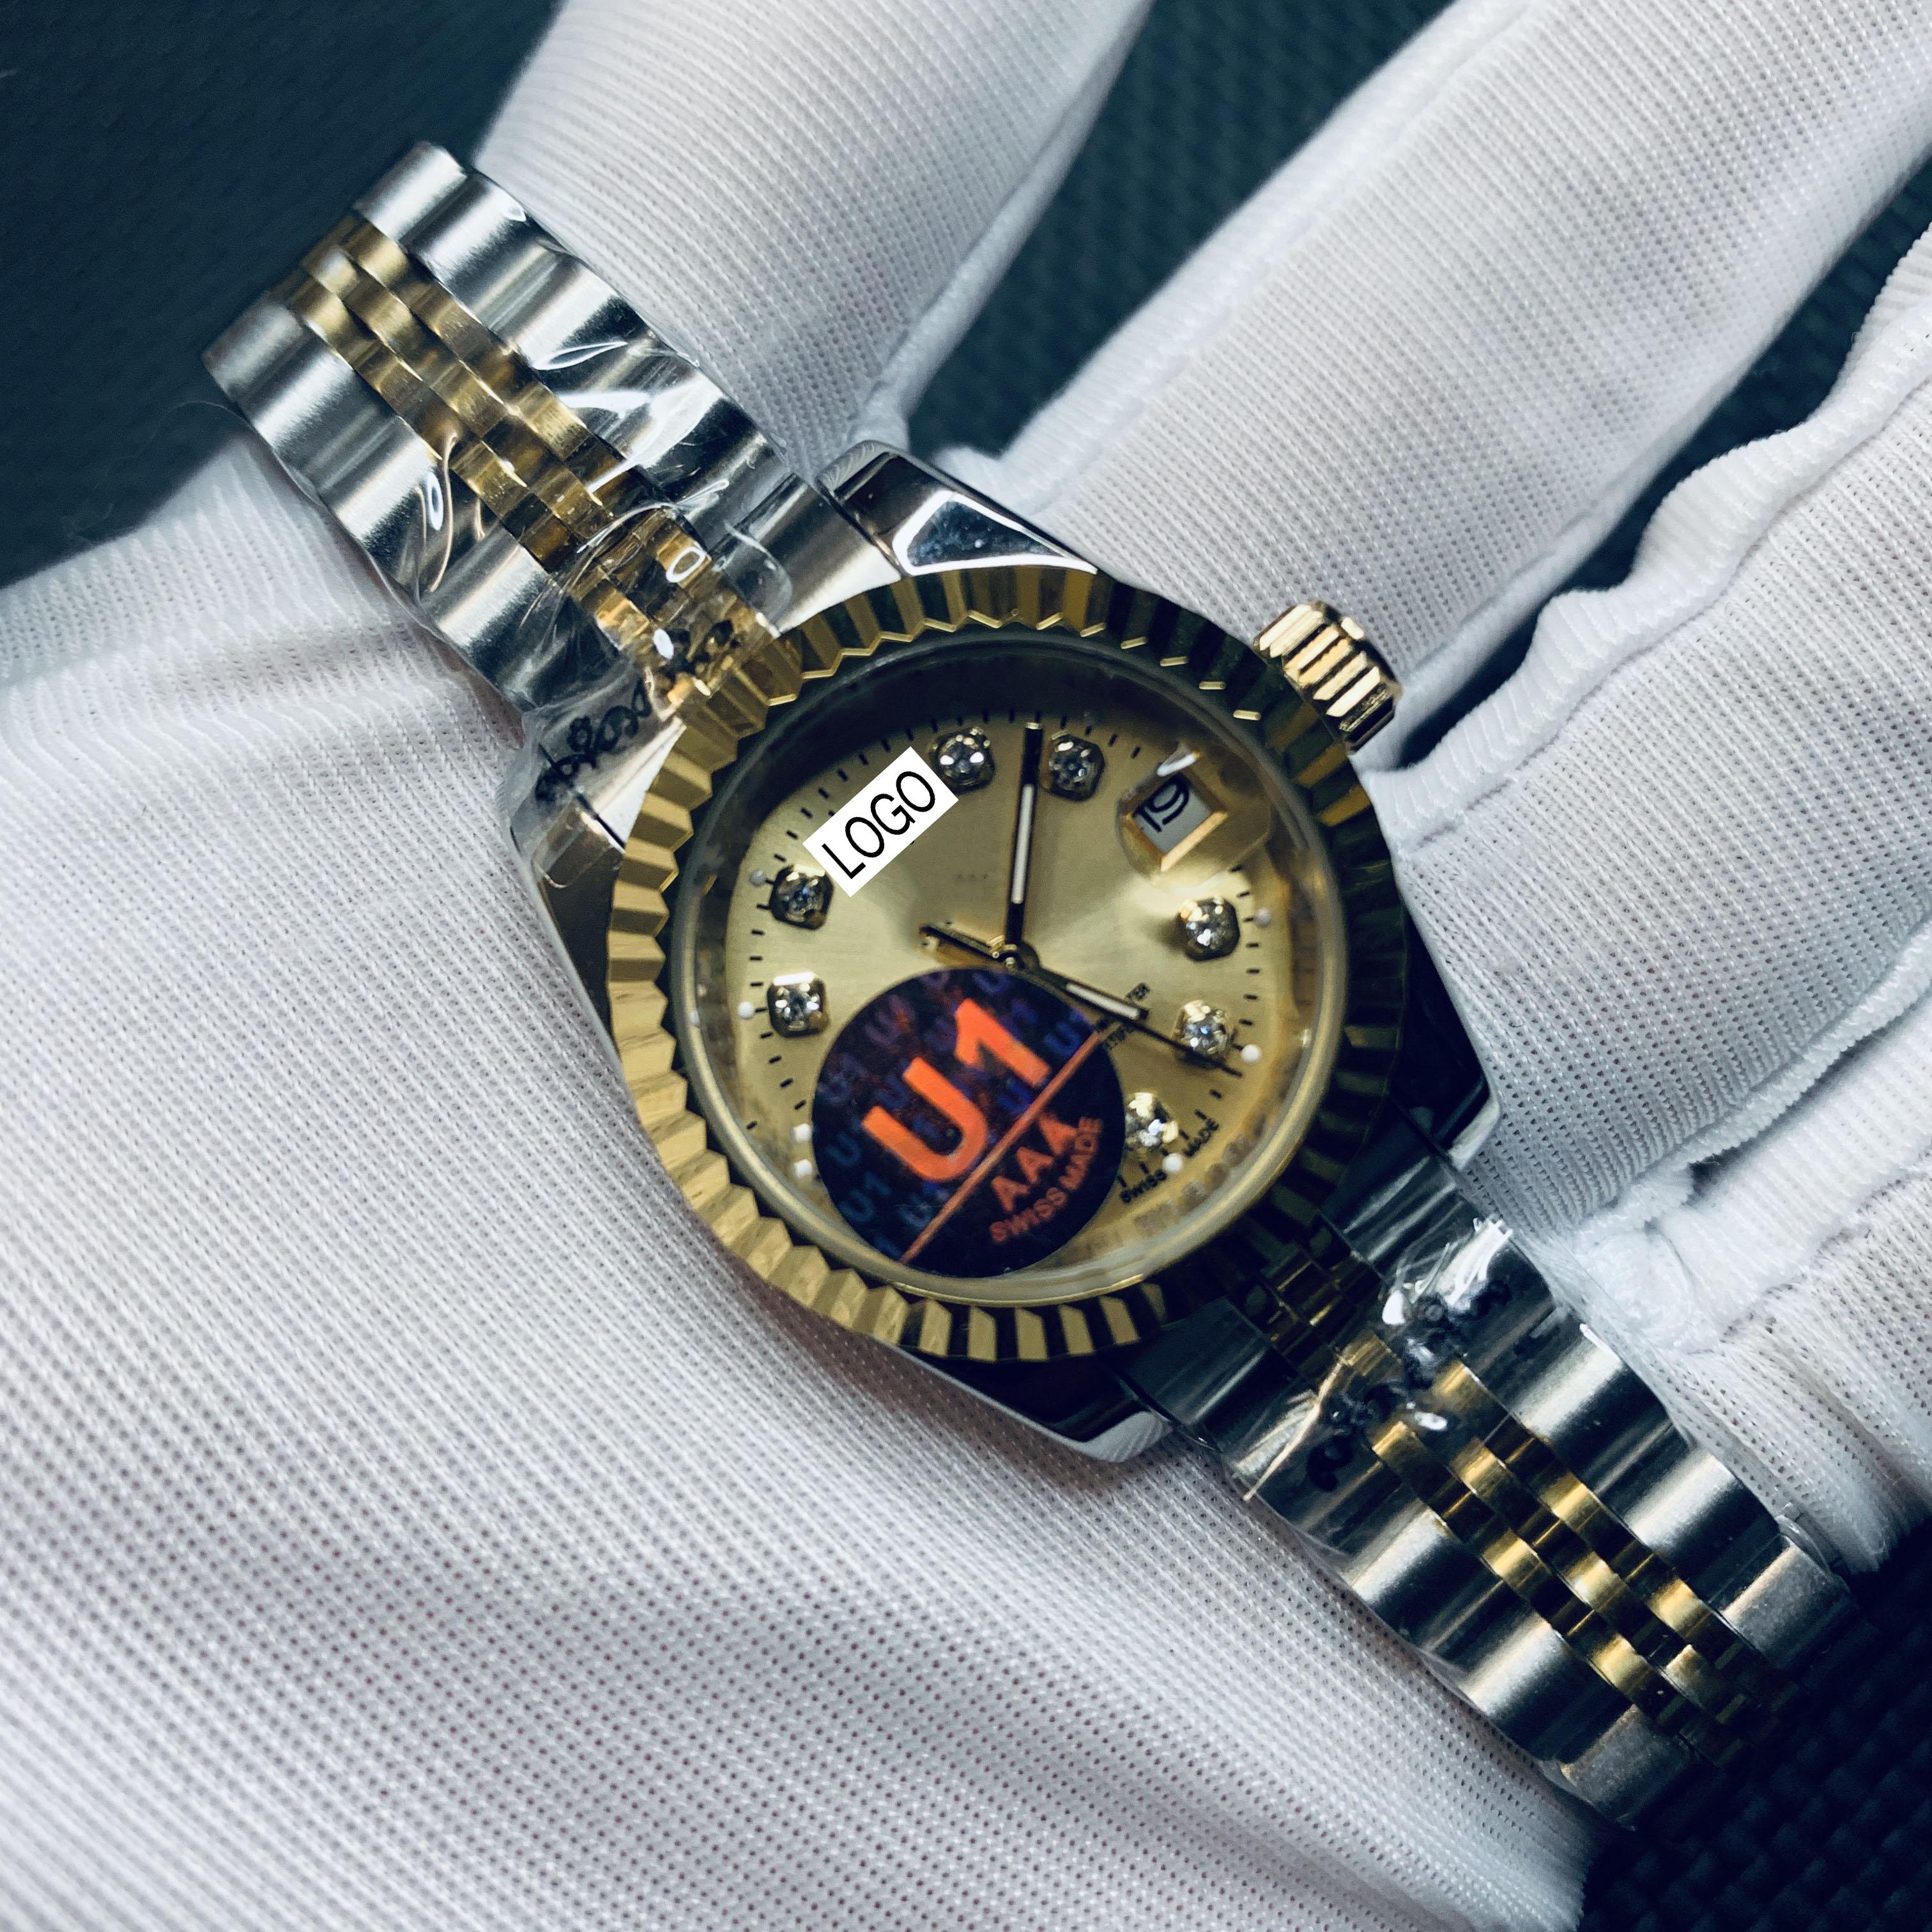 Hot sale ladies watch 18K gold dial ladies watch 28mm automatic mechanical sweep movement luxury brand ladies watch date enlarge